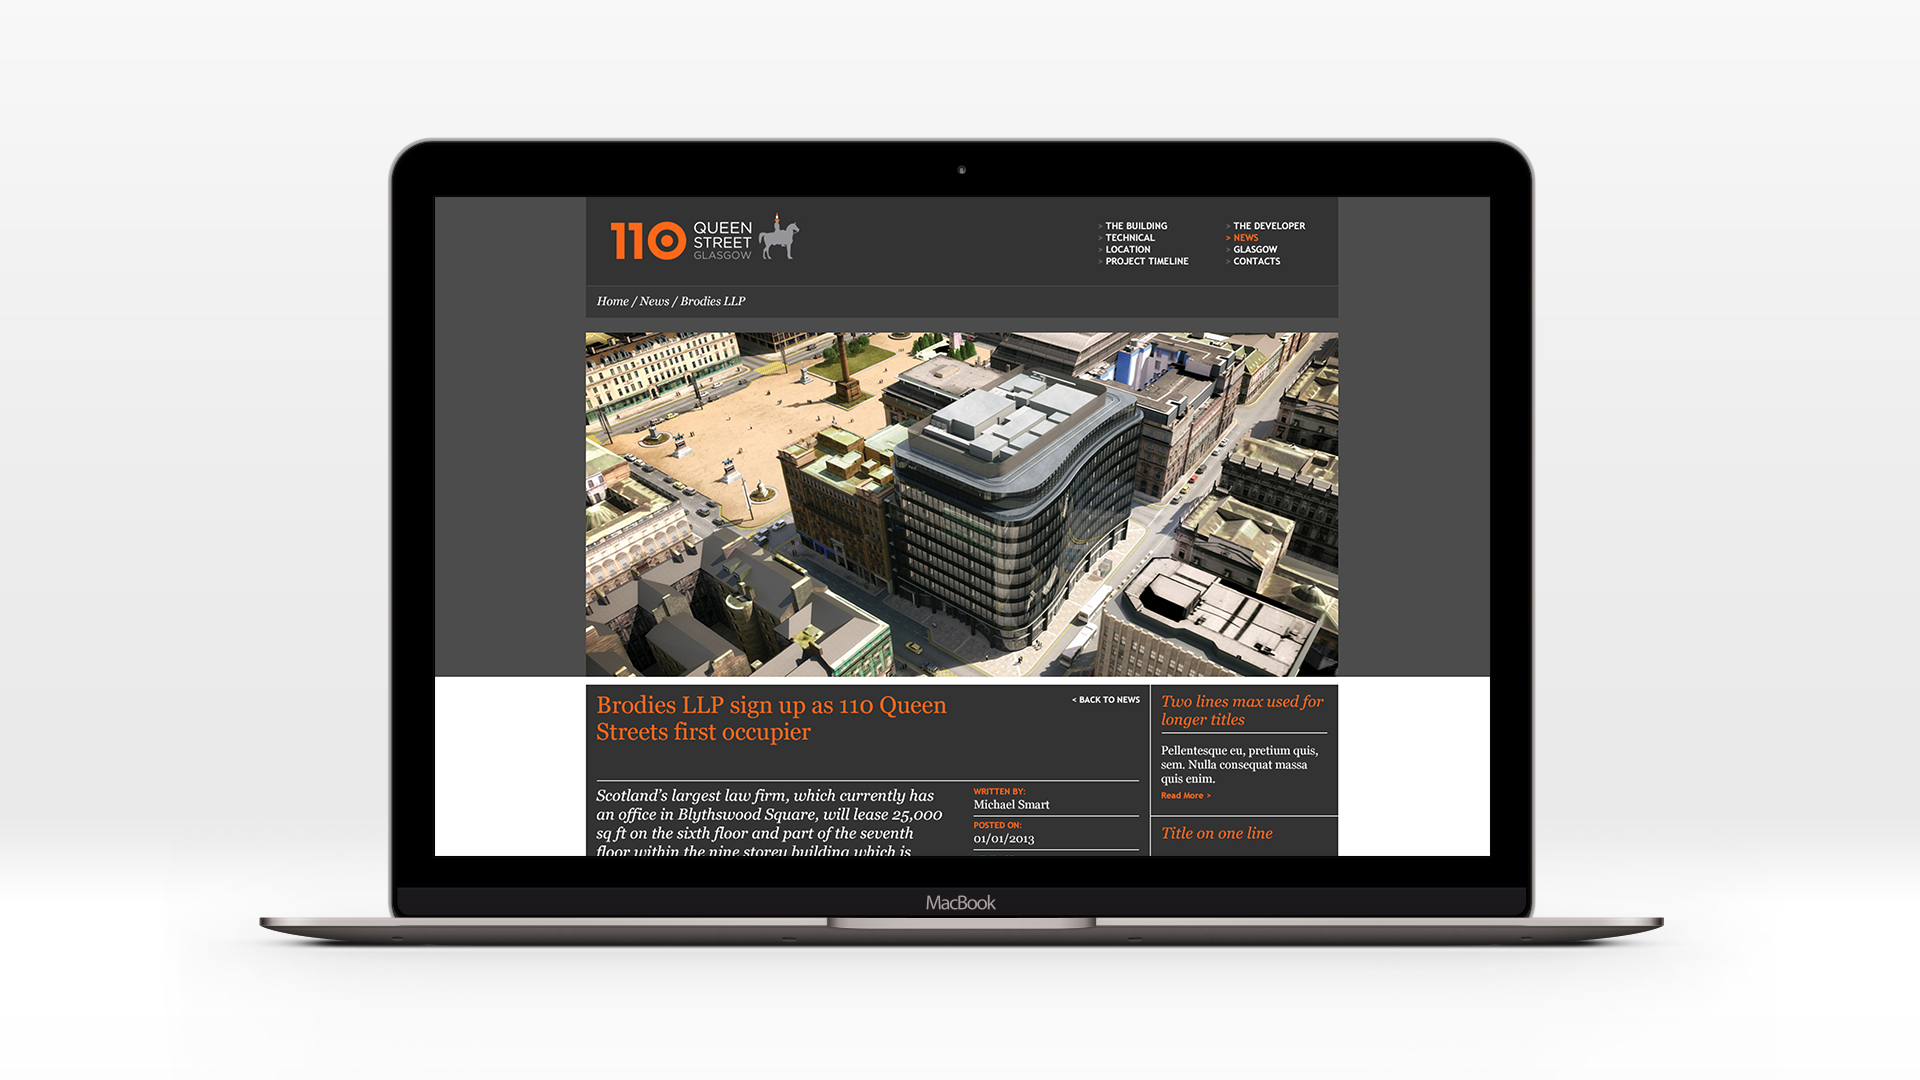 openagency_bam-brand_1920x1080_website_4